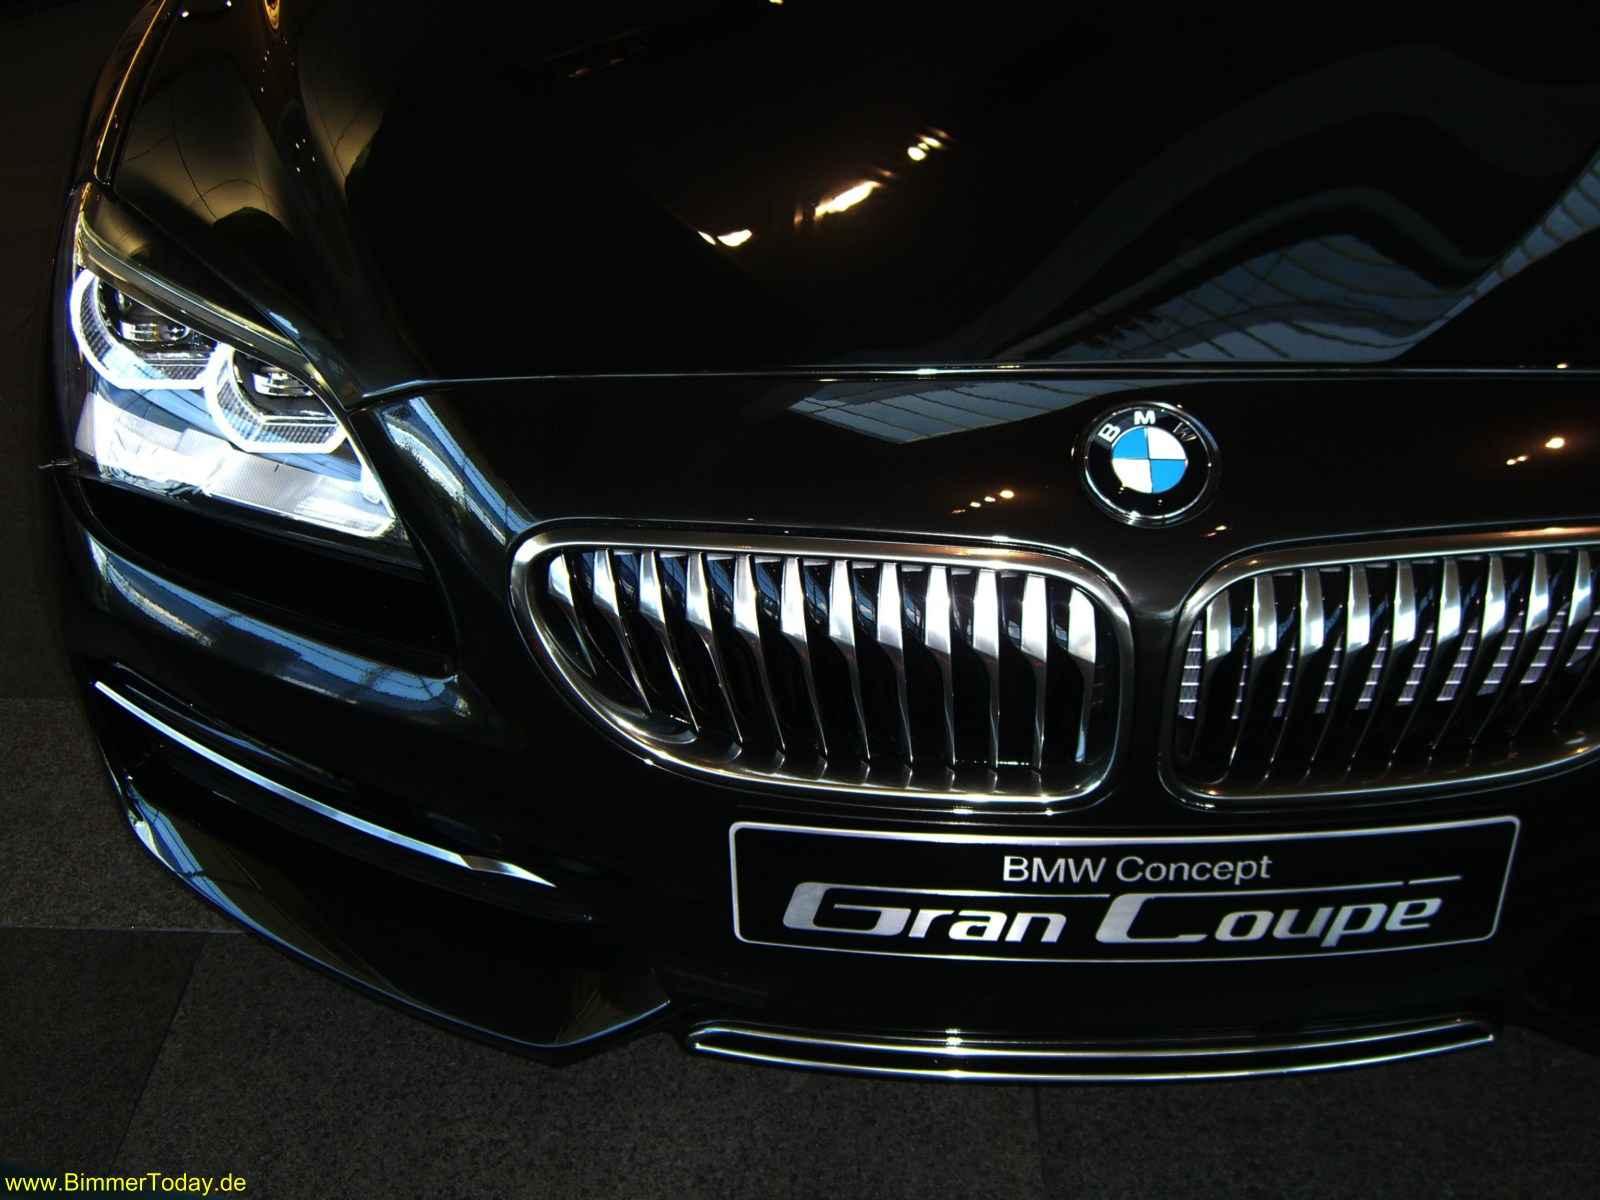 BMW-Concept-Gran-Coupé-BMW-Welt-14